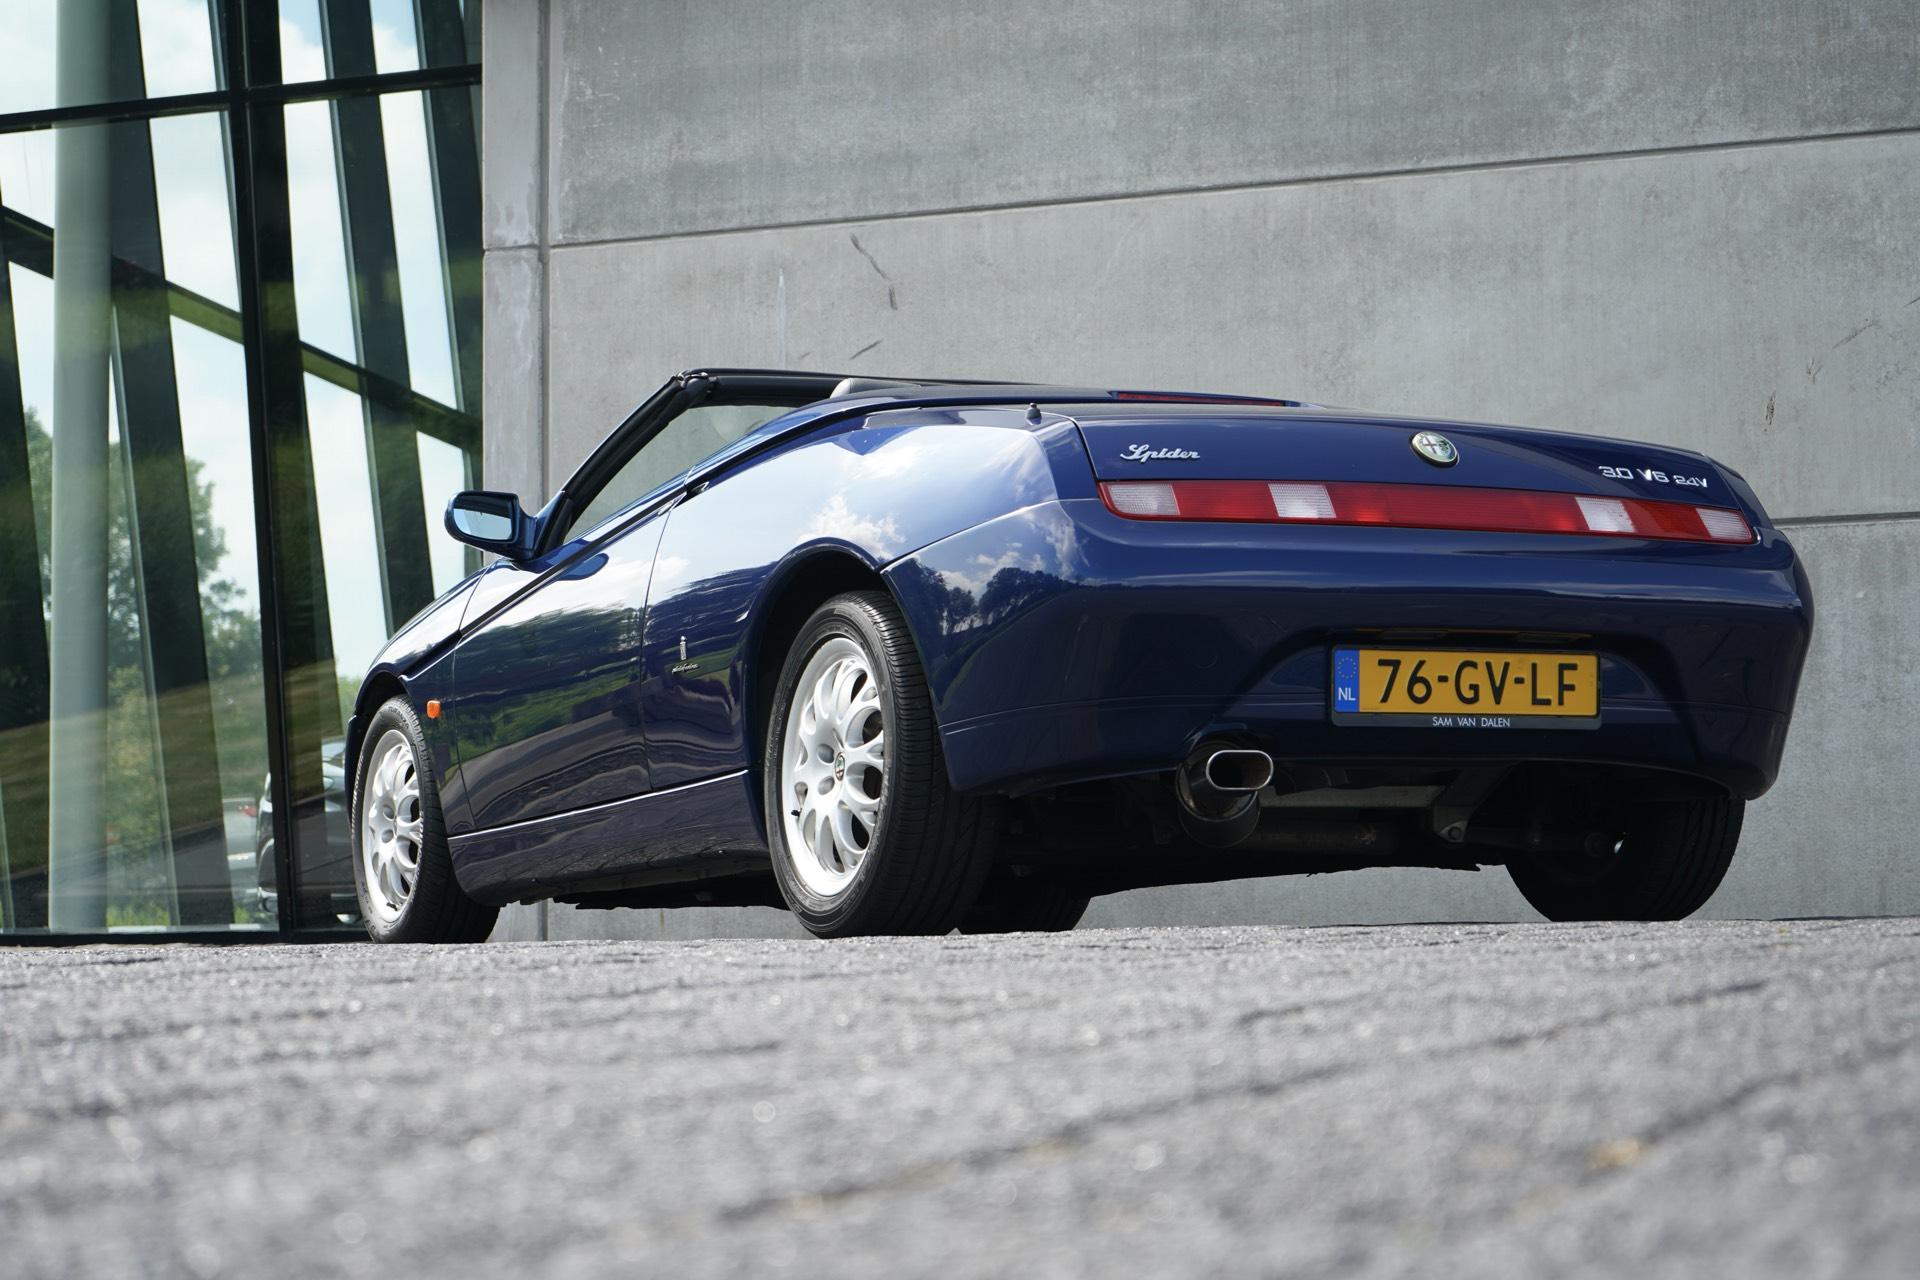 ALFA SPIDER 3.0 V6 24V L